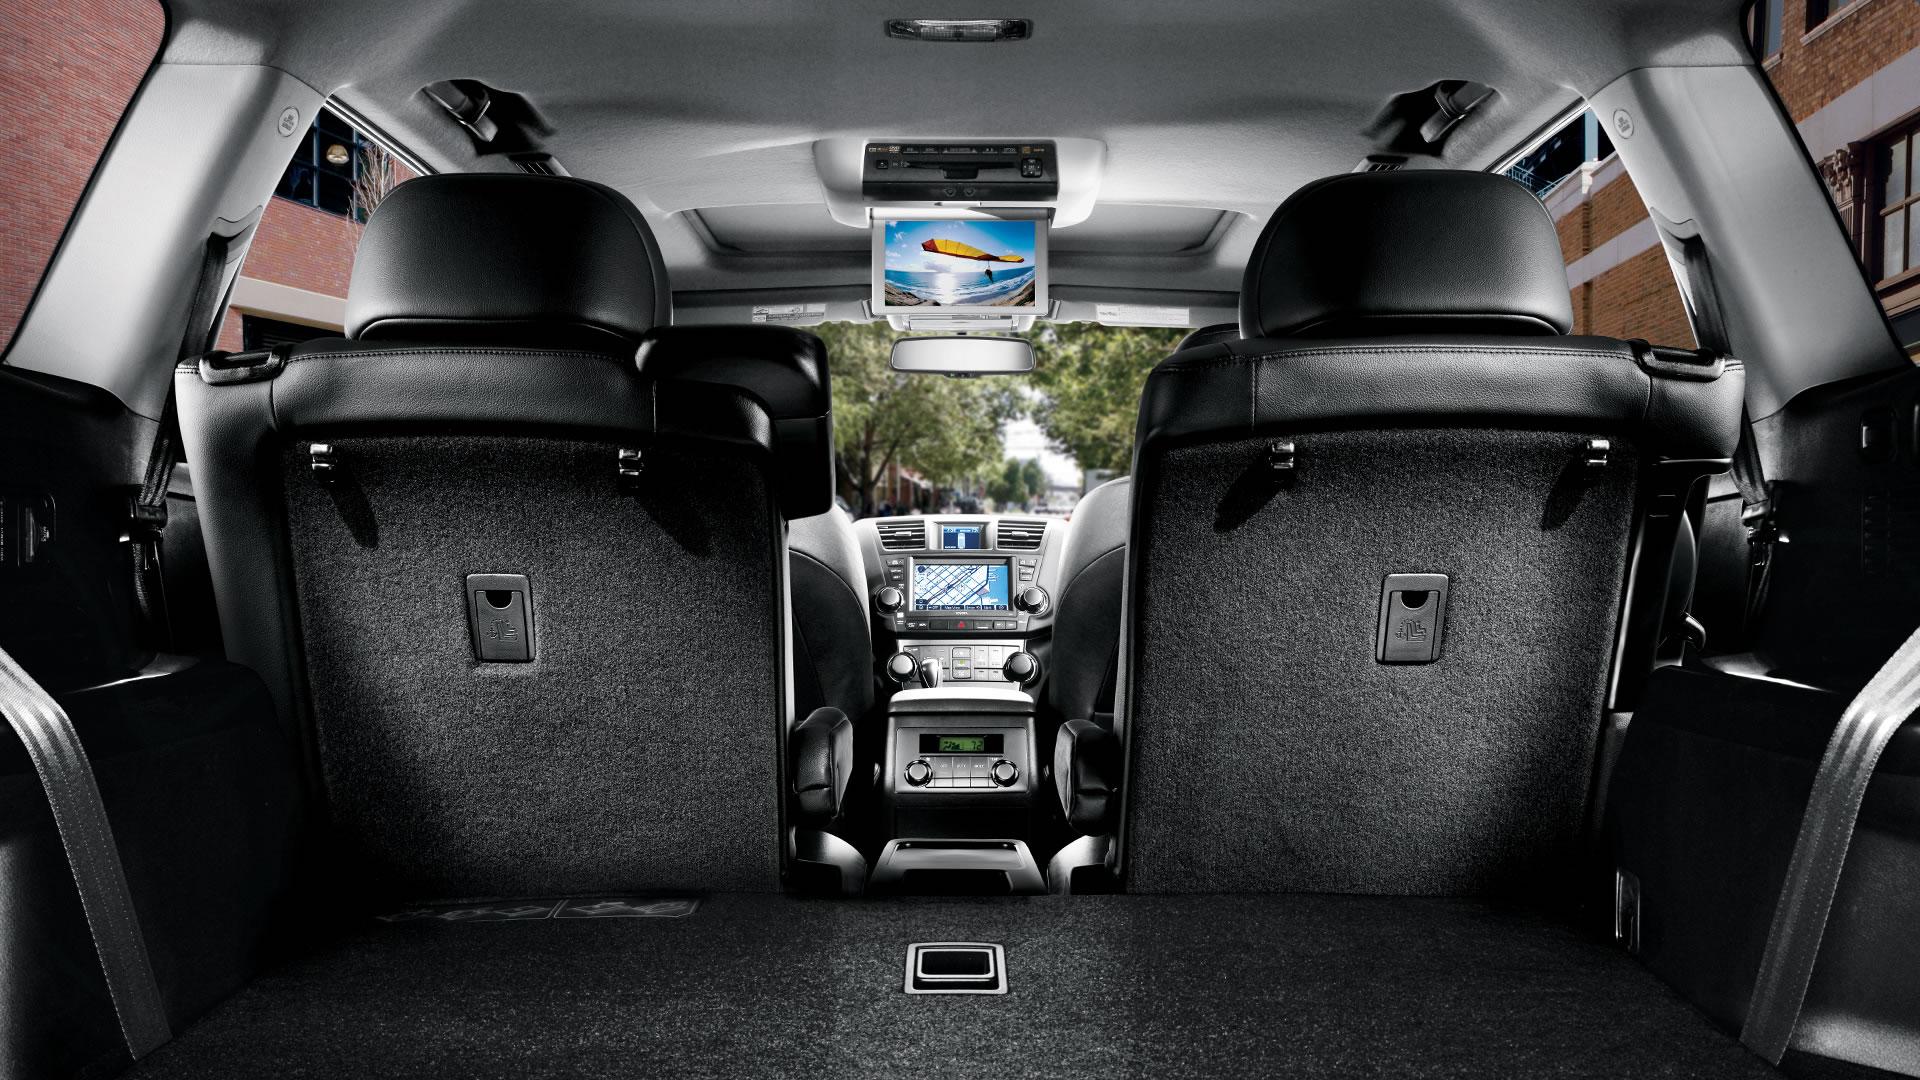 New 2013 Toyota Highlander Interstate Toyota